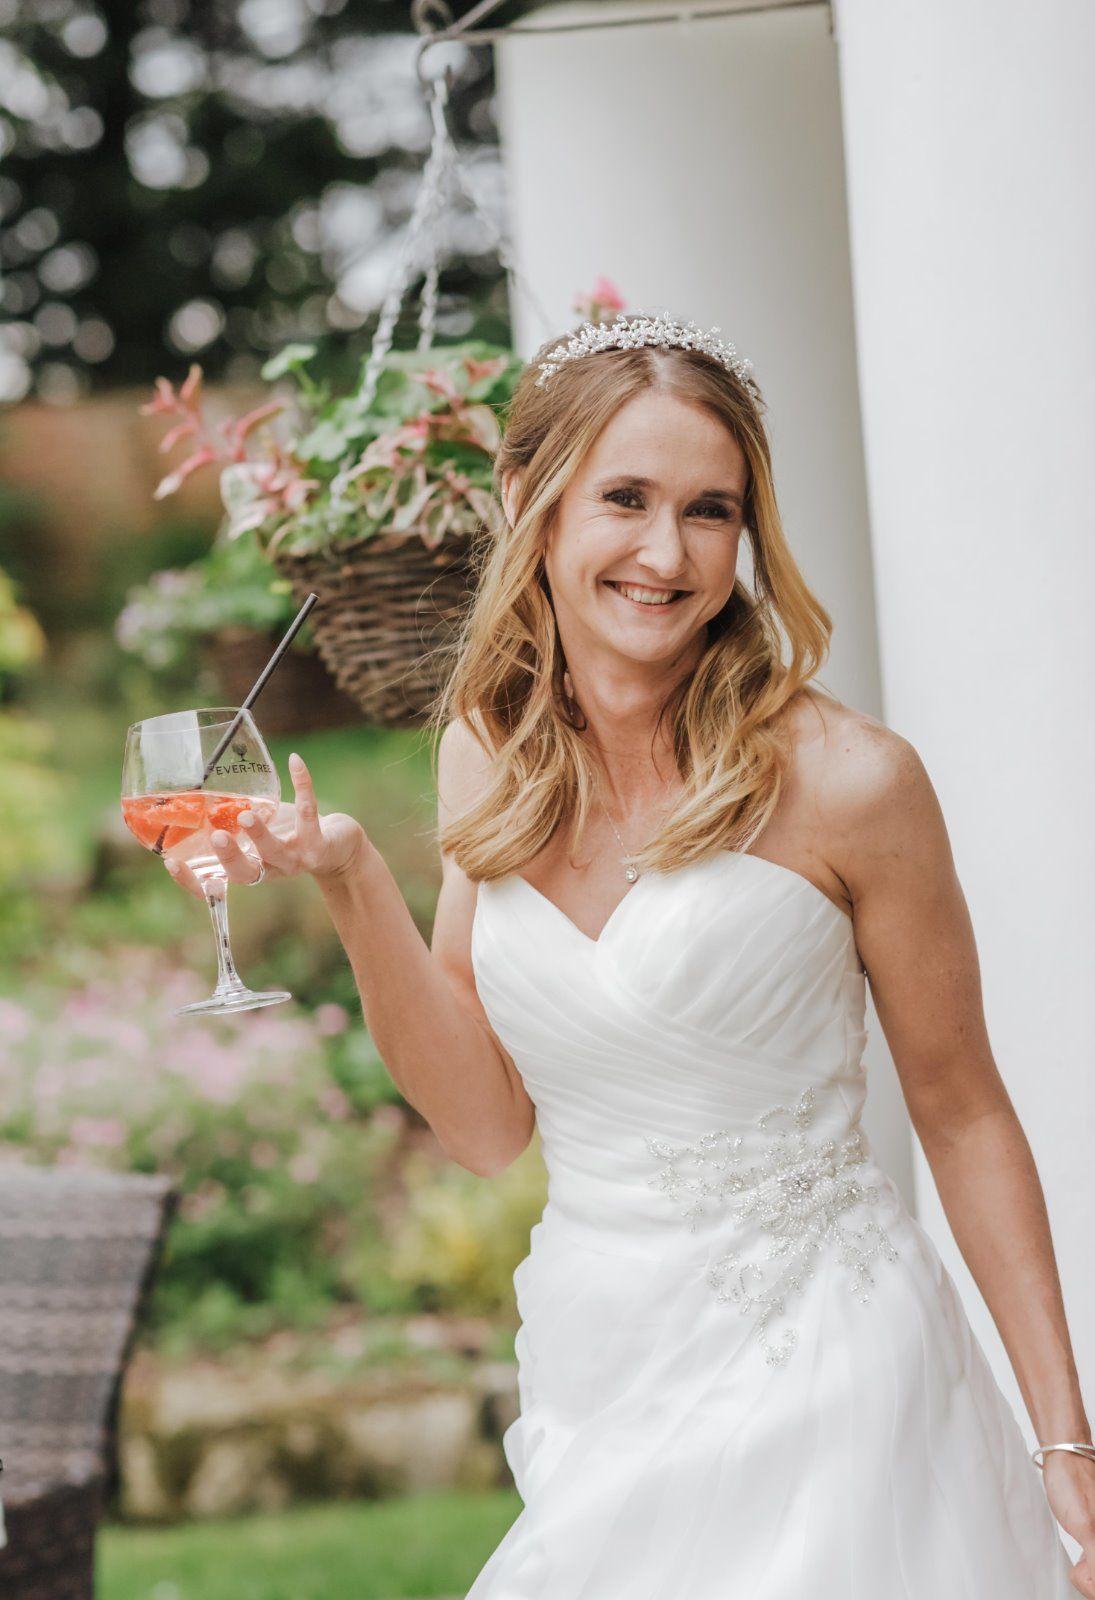 Yorkshire and Derbyshire wedding photographer